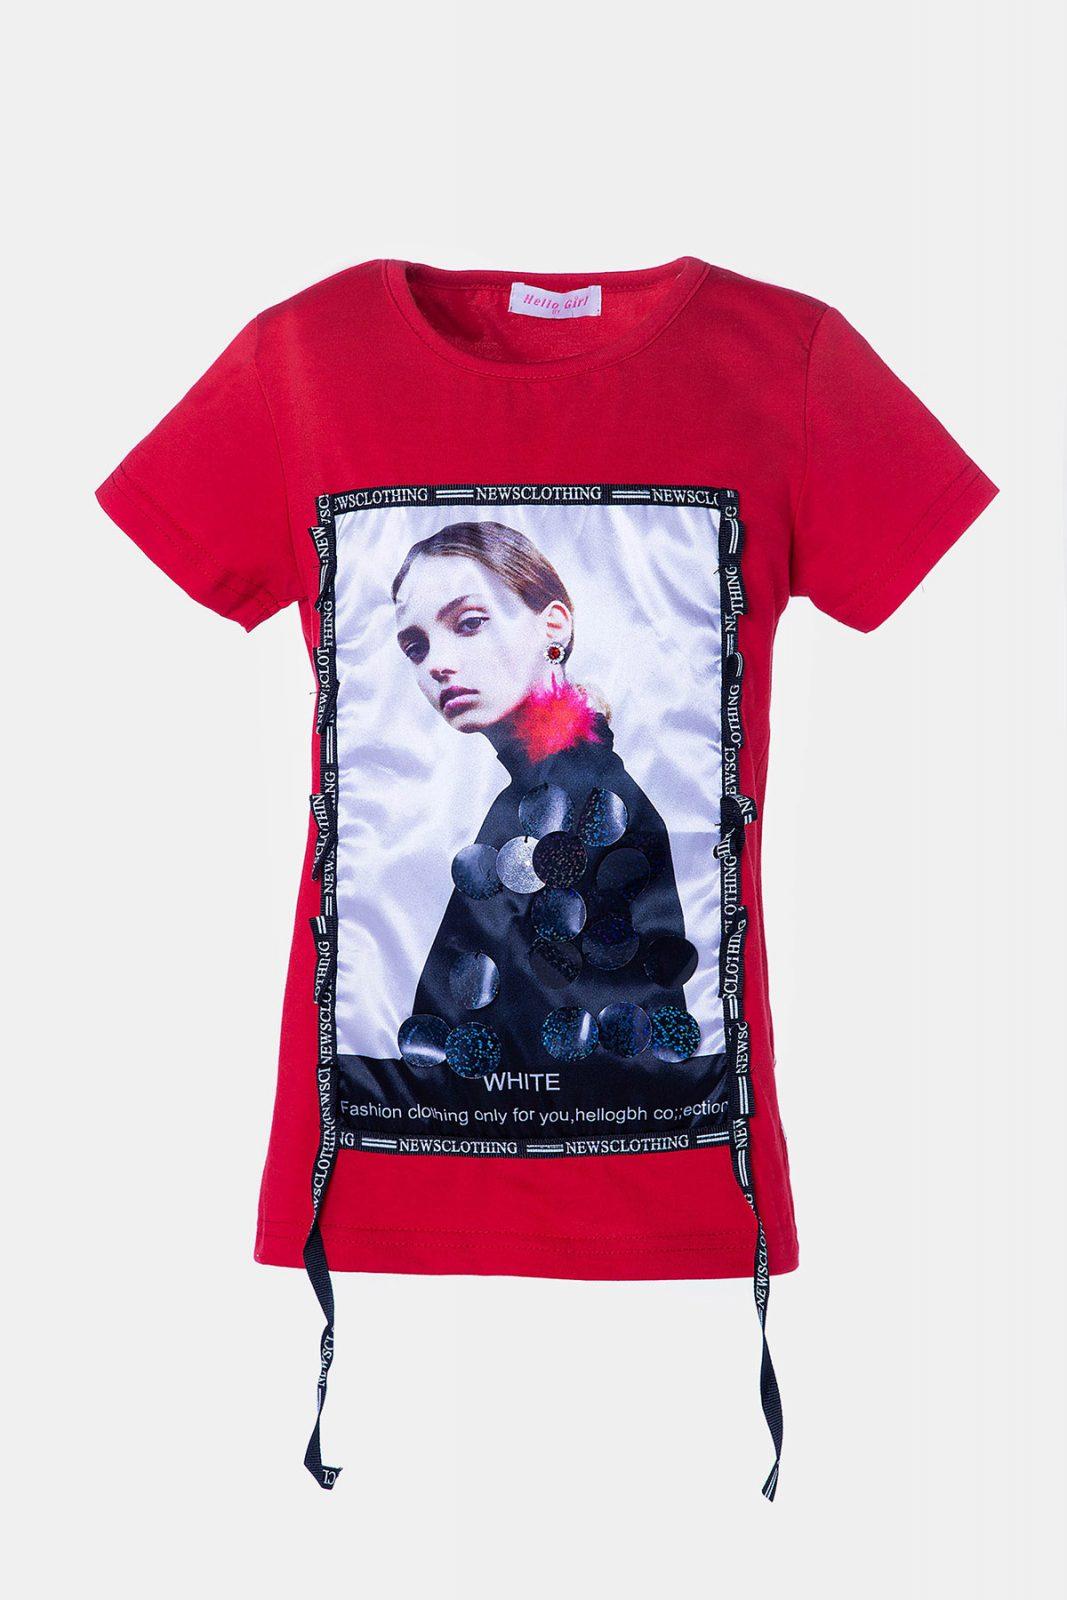 f1b728a90eee Κόκκινη μπλούζα για Κορίτσια - Ersas Παιδικά, Βρεφικά Ρούχα